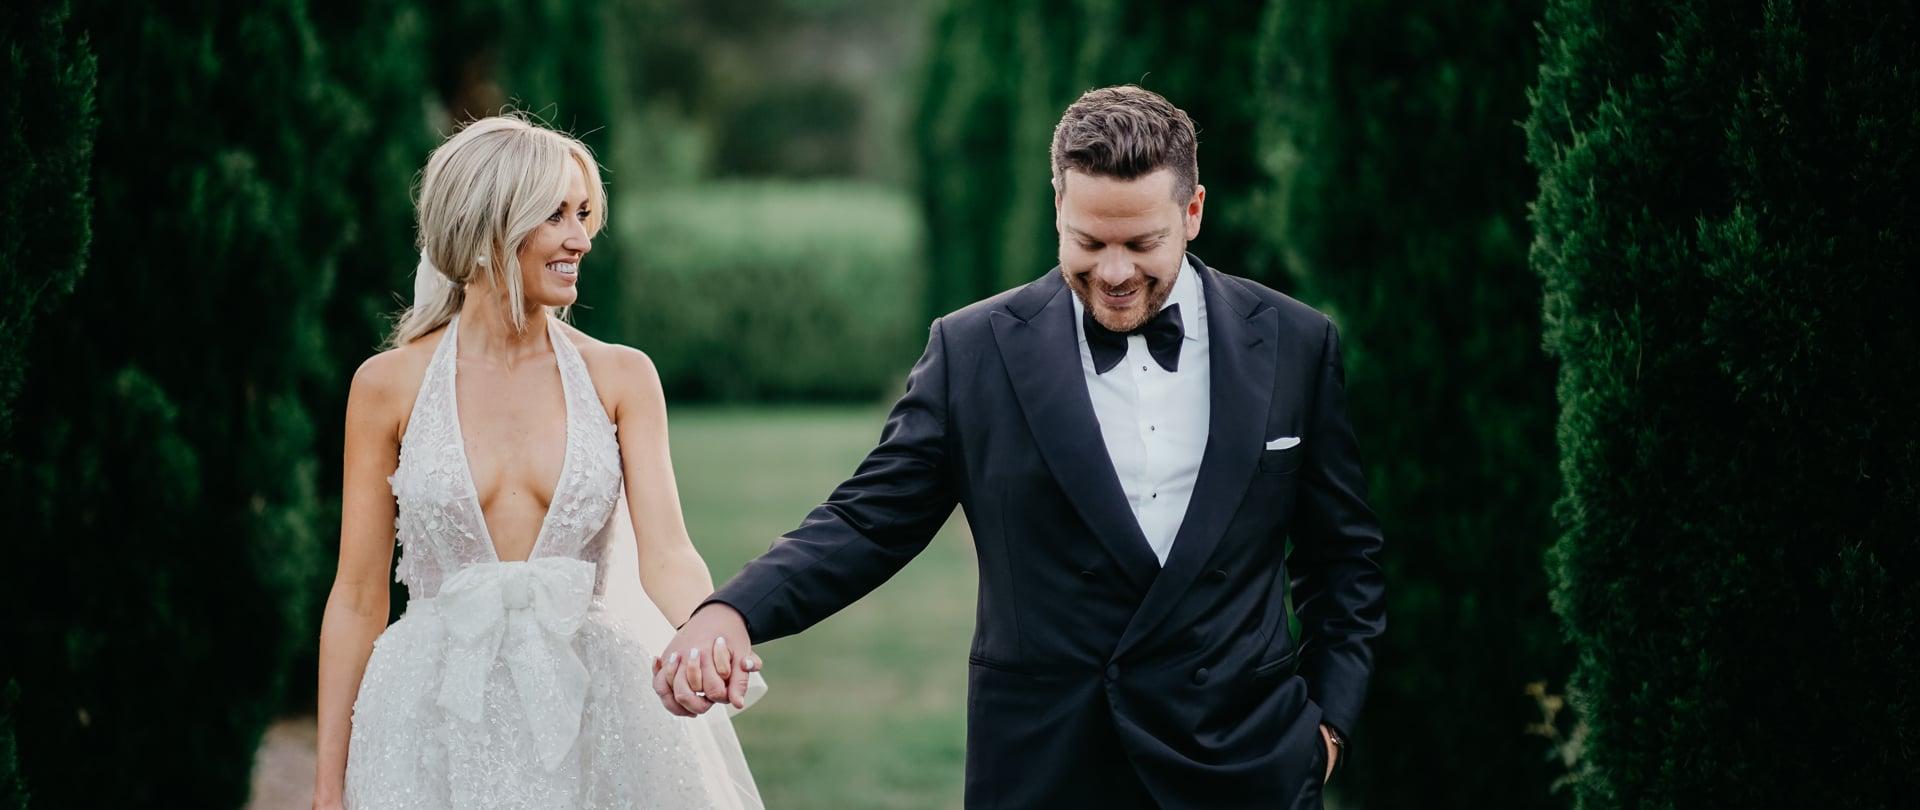 Montarna & Nick Wedding Video Filmed at Hunter Valley, New South Wales